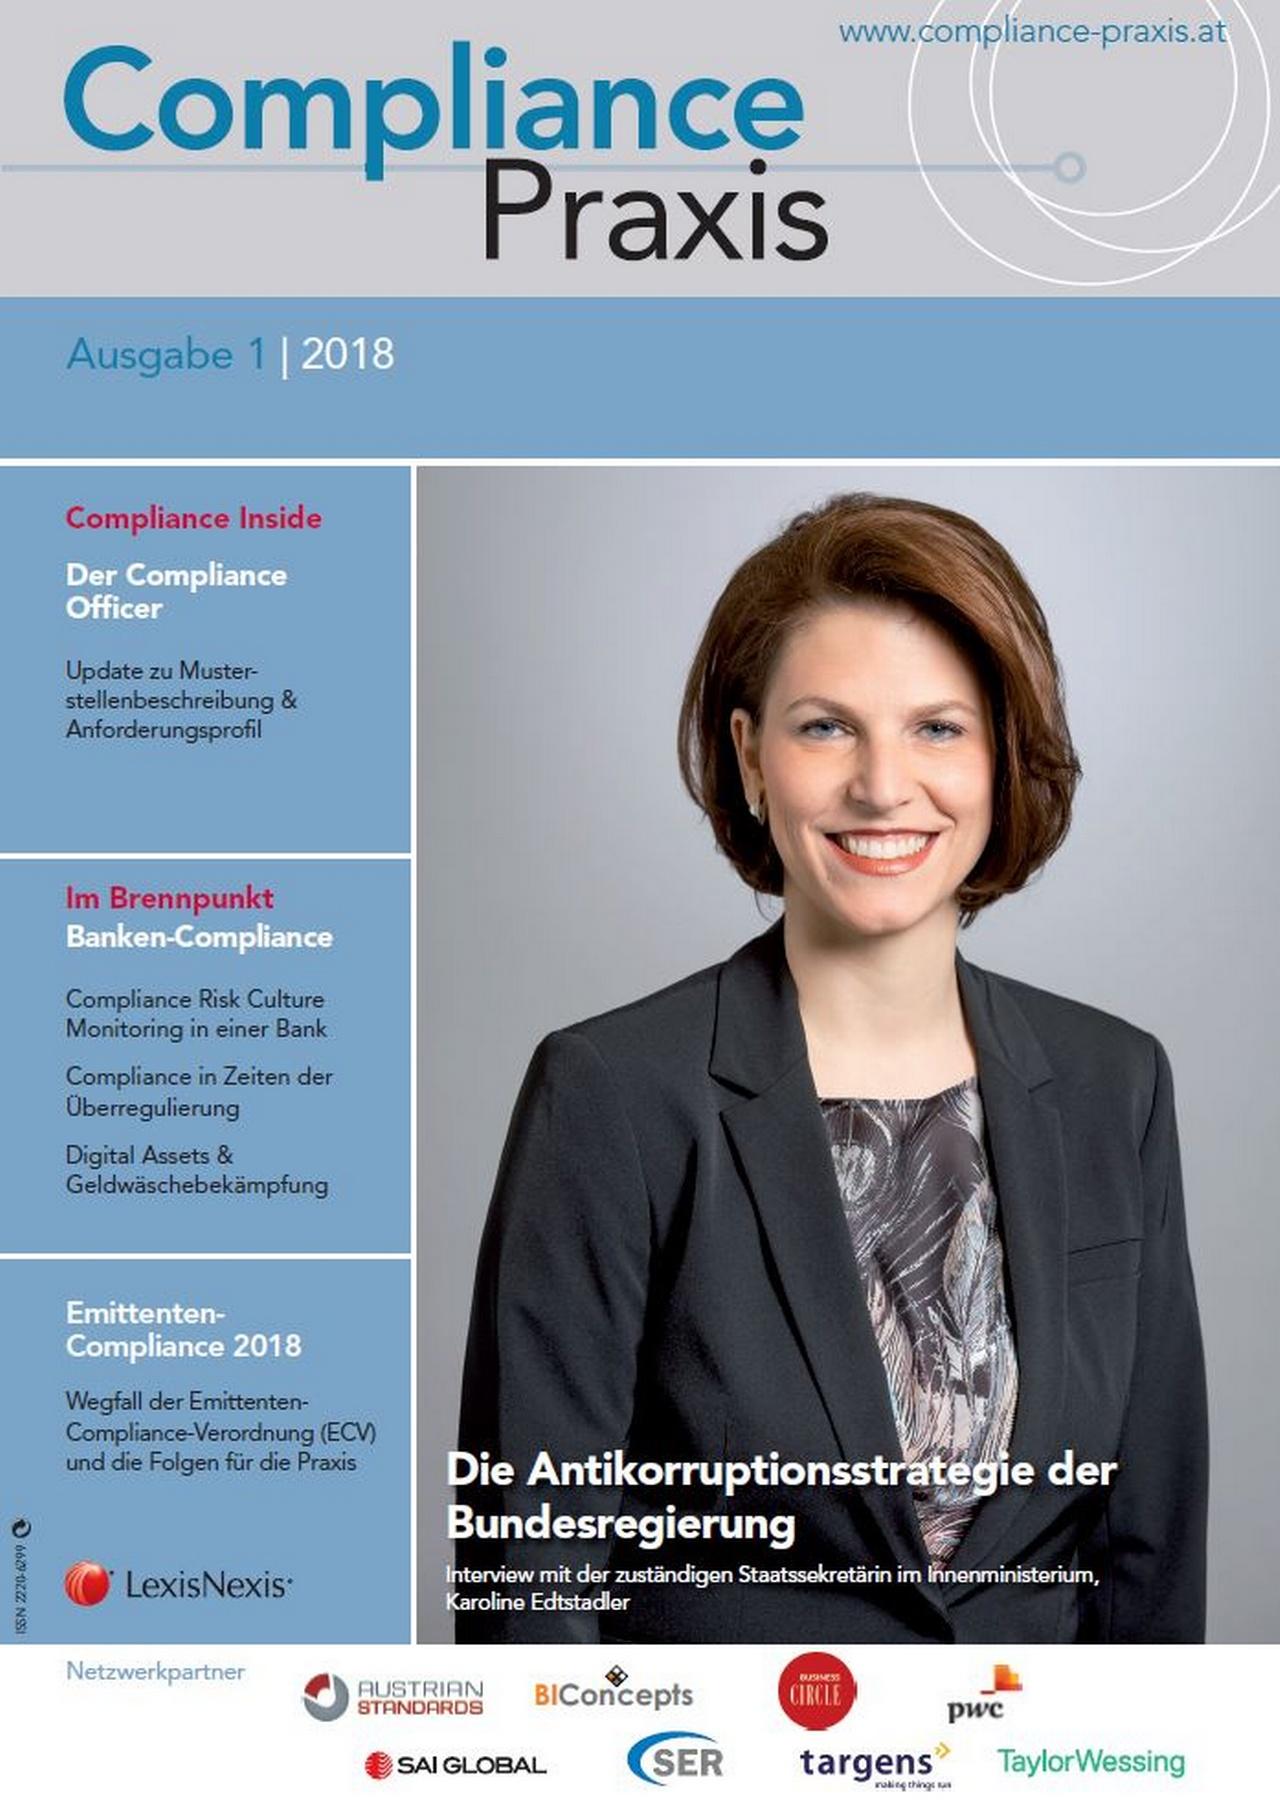 Cover von Compliance Praxis Ausgabe 1/2018, © LexisNexis